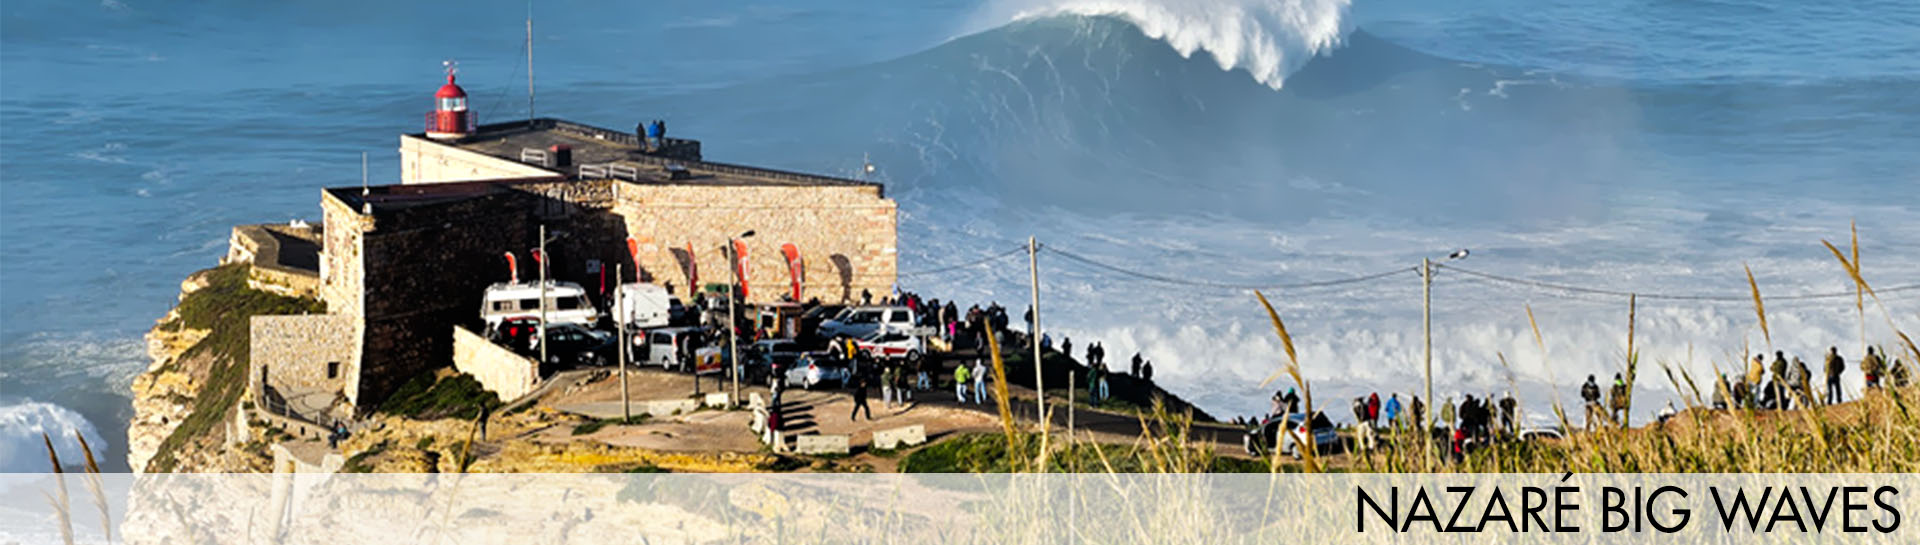 NAZARE BIG WAVES